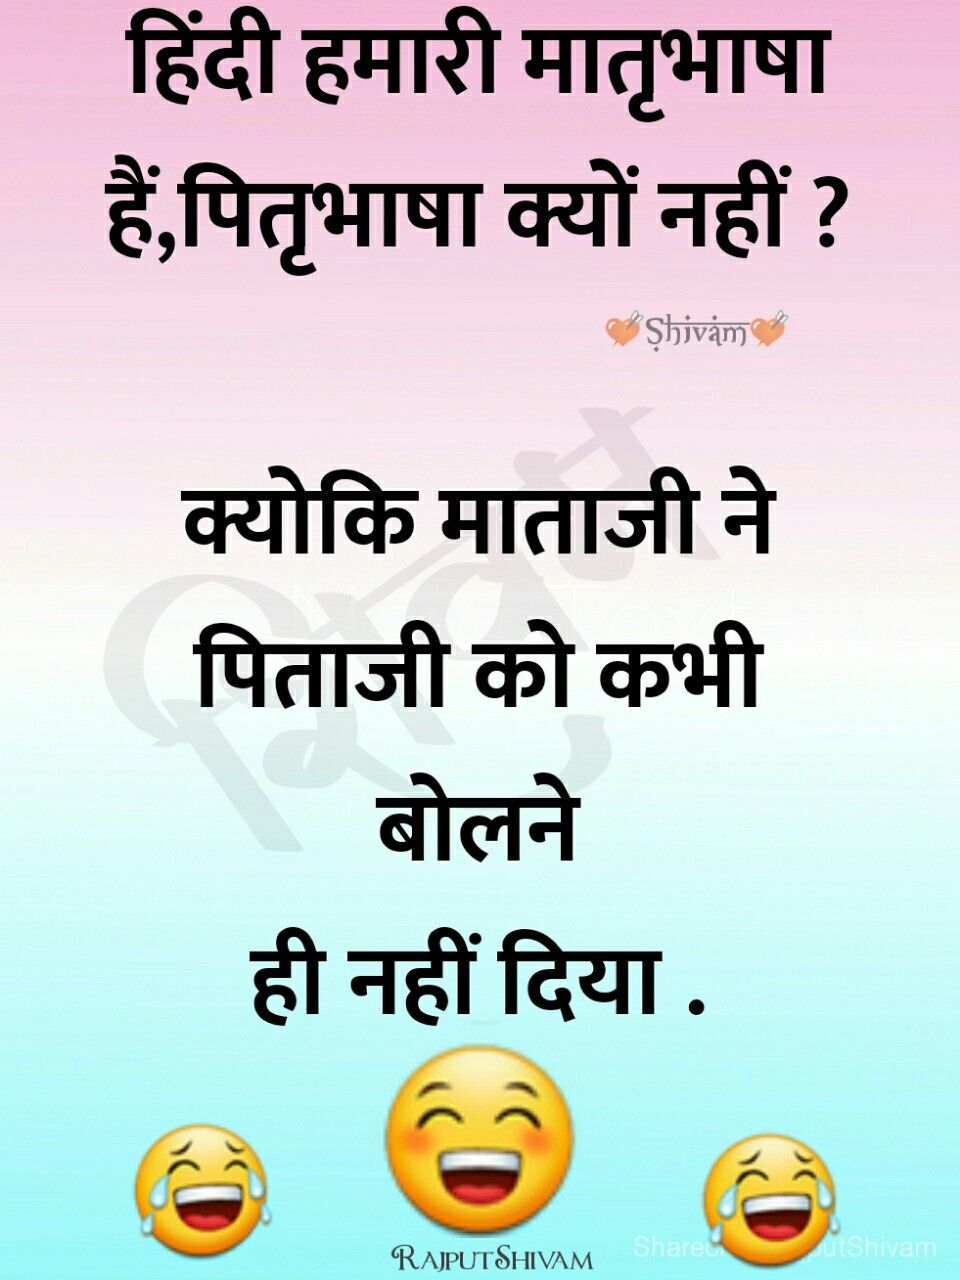 Pin By Gulkash On Jokes Some Funny Jokes Fun Quotes Funny Jokes Quotes